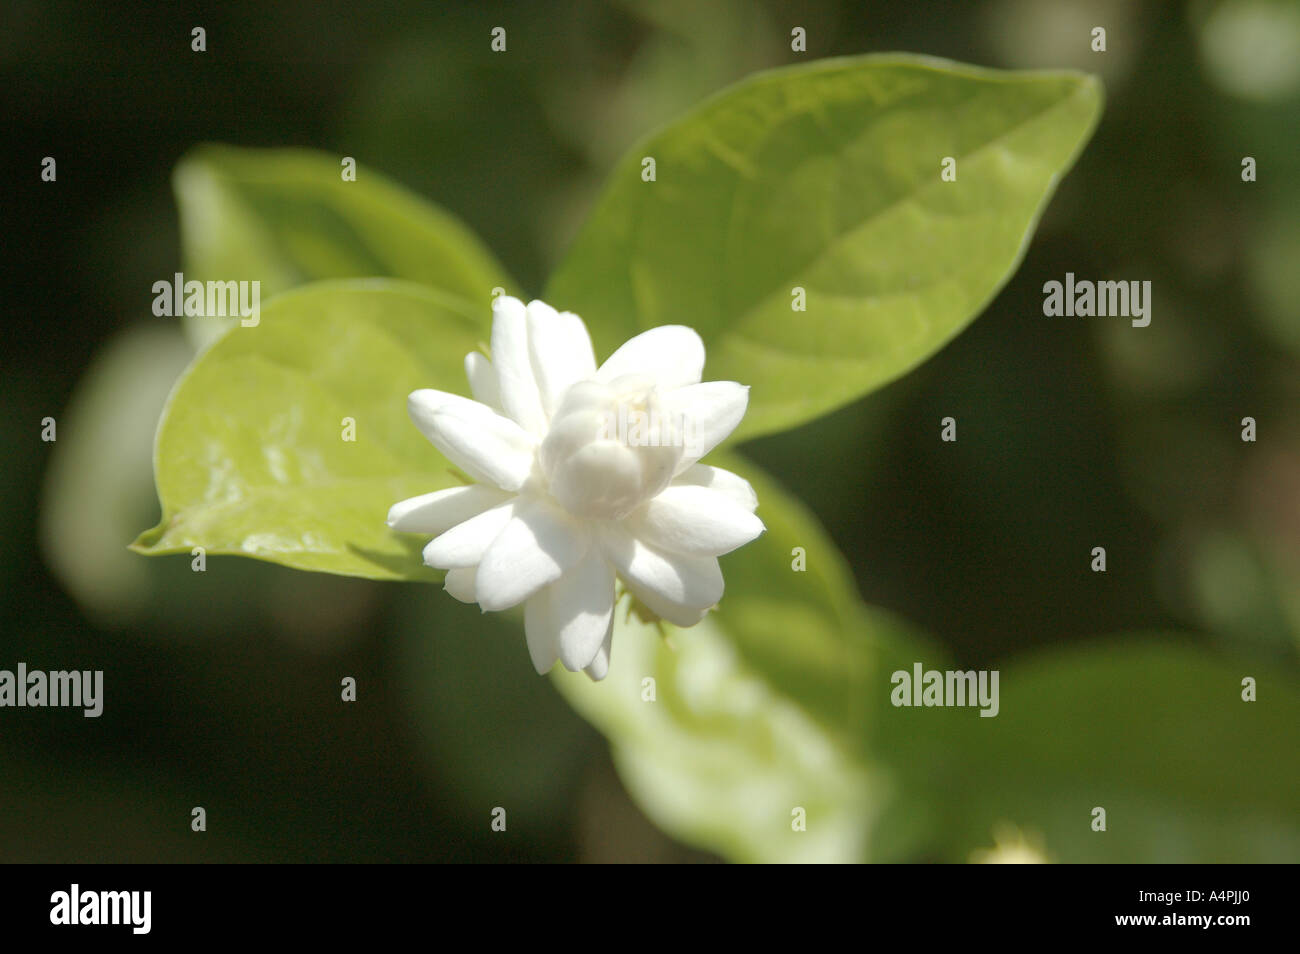 Flower Motia Mogra Jasmine Stock Photos Flower Motia Mogra Jasmine